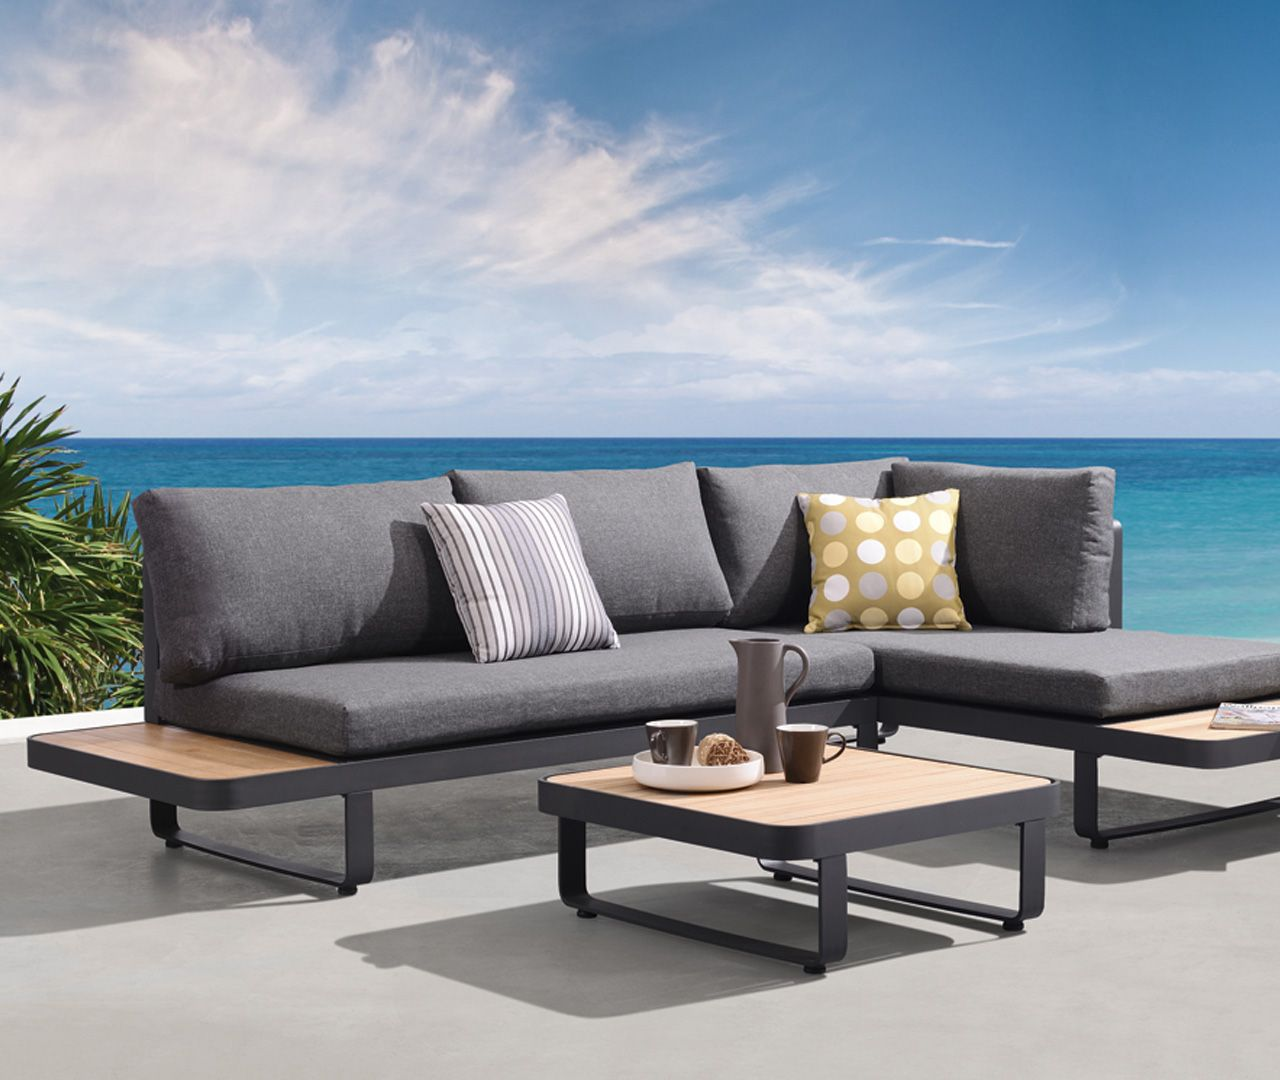 Plattform Lounge New Polo Mobel Egger Lounge Mobel Balkon Lounge Mobel Outdoor Lounge Mobel